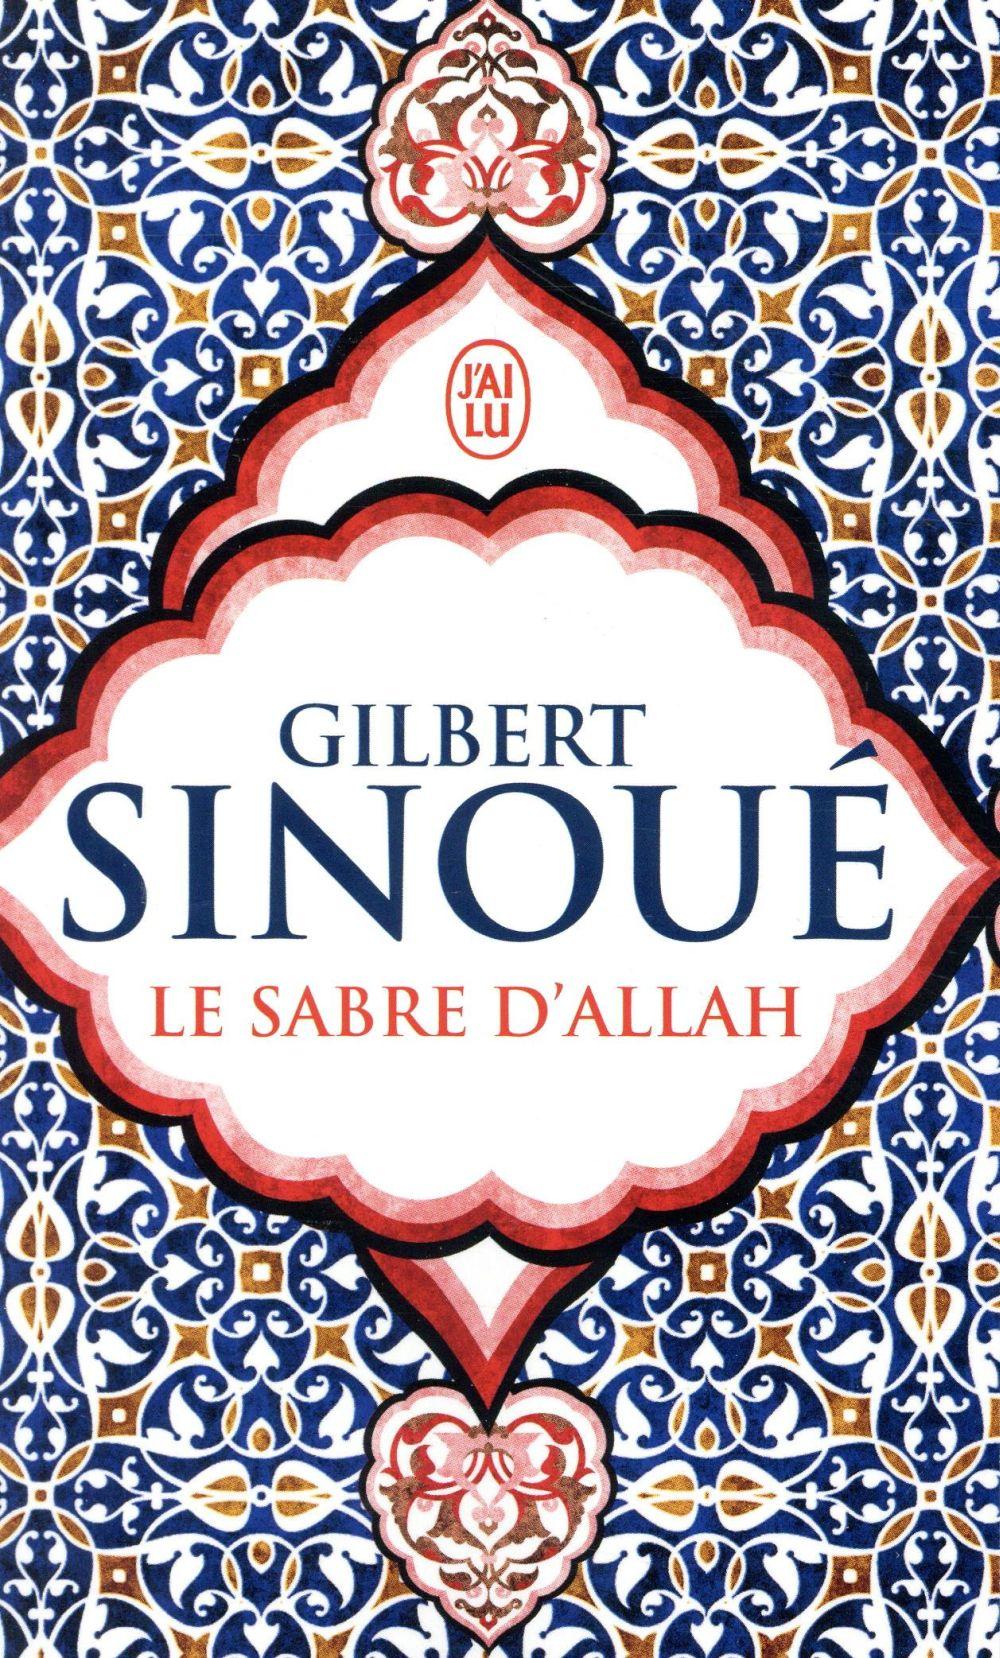 LE SABRE D'ALLAH SINOUE, GILBERT J'AI LU